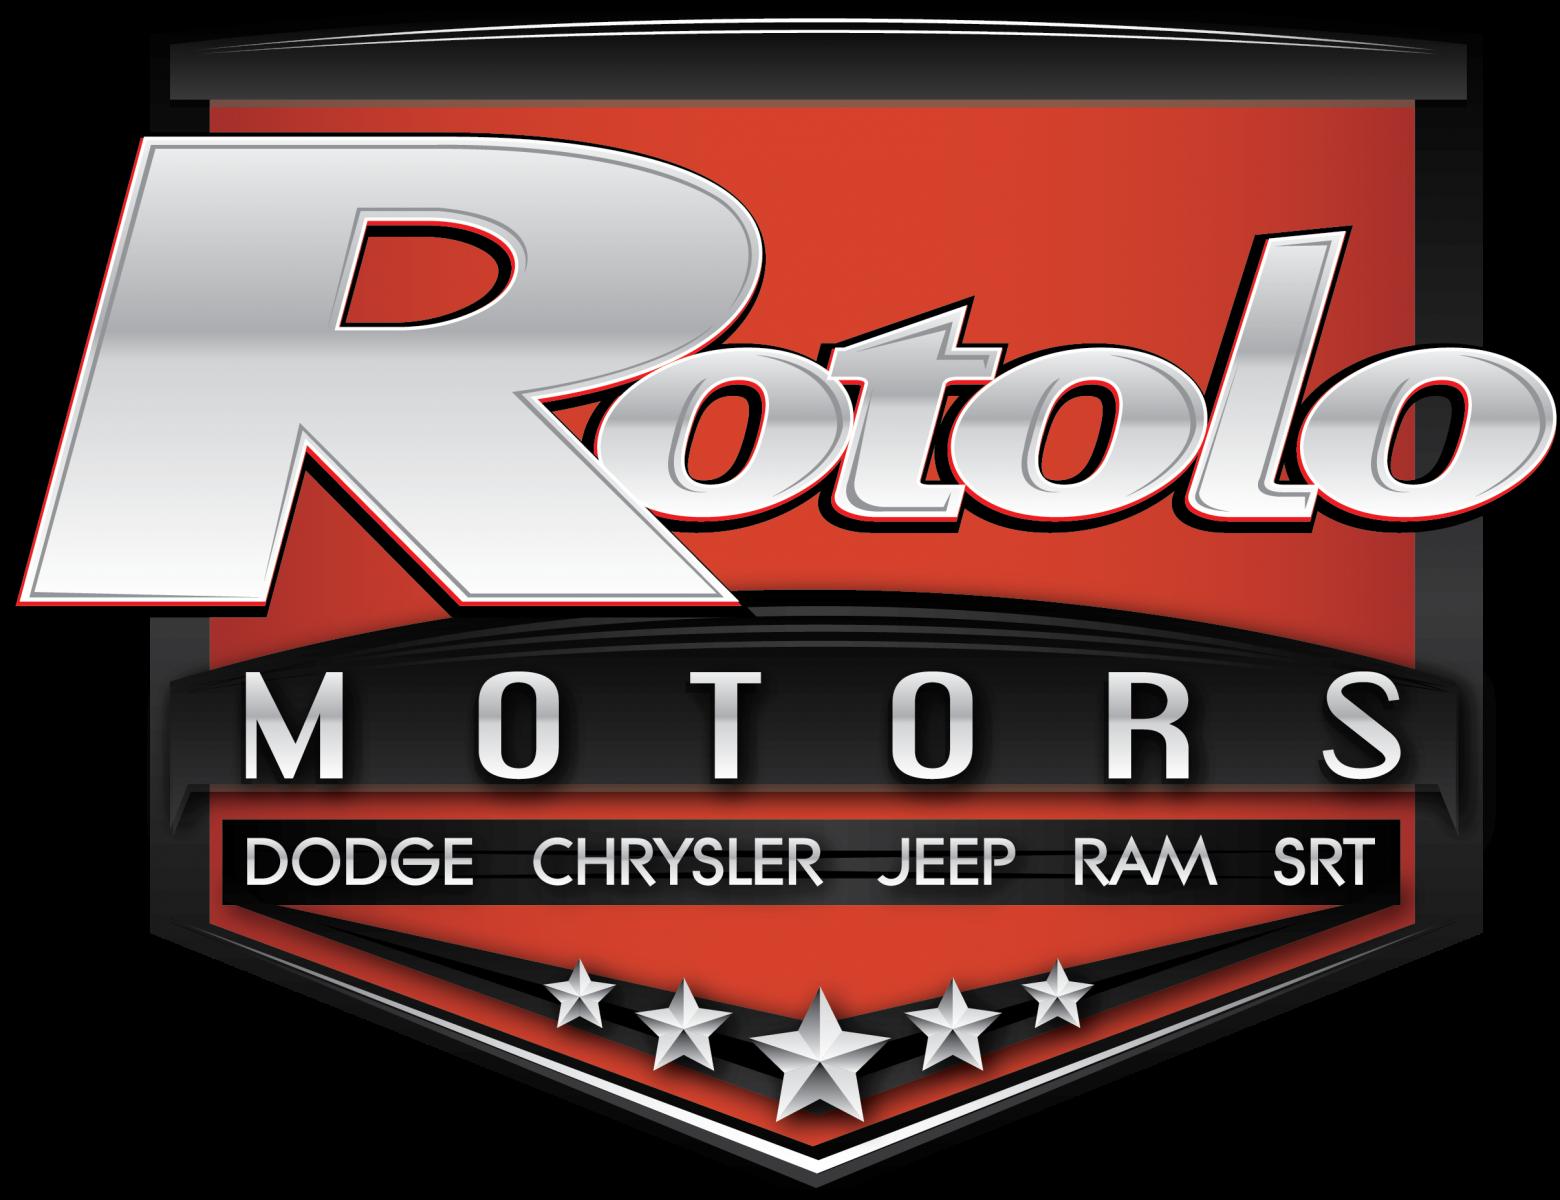 Rotolo Dodge Chrysler Jeep Ram